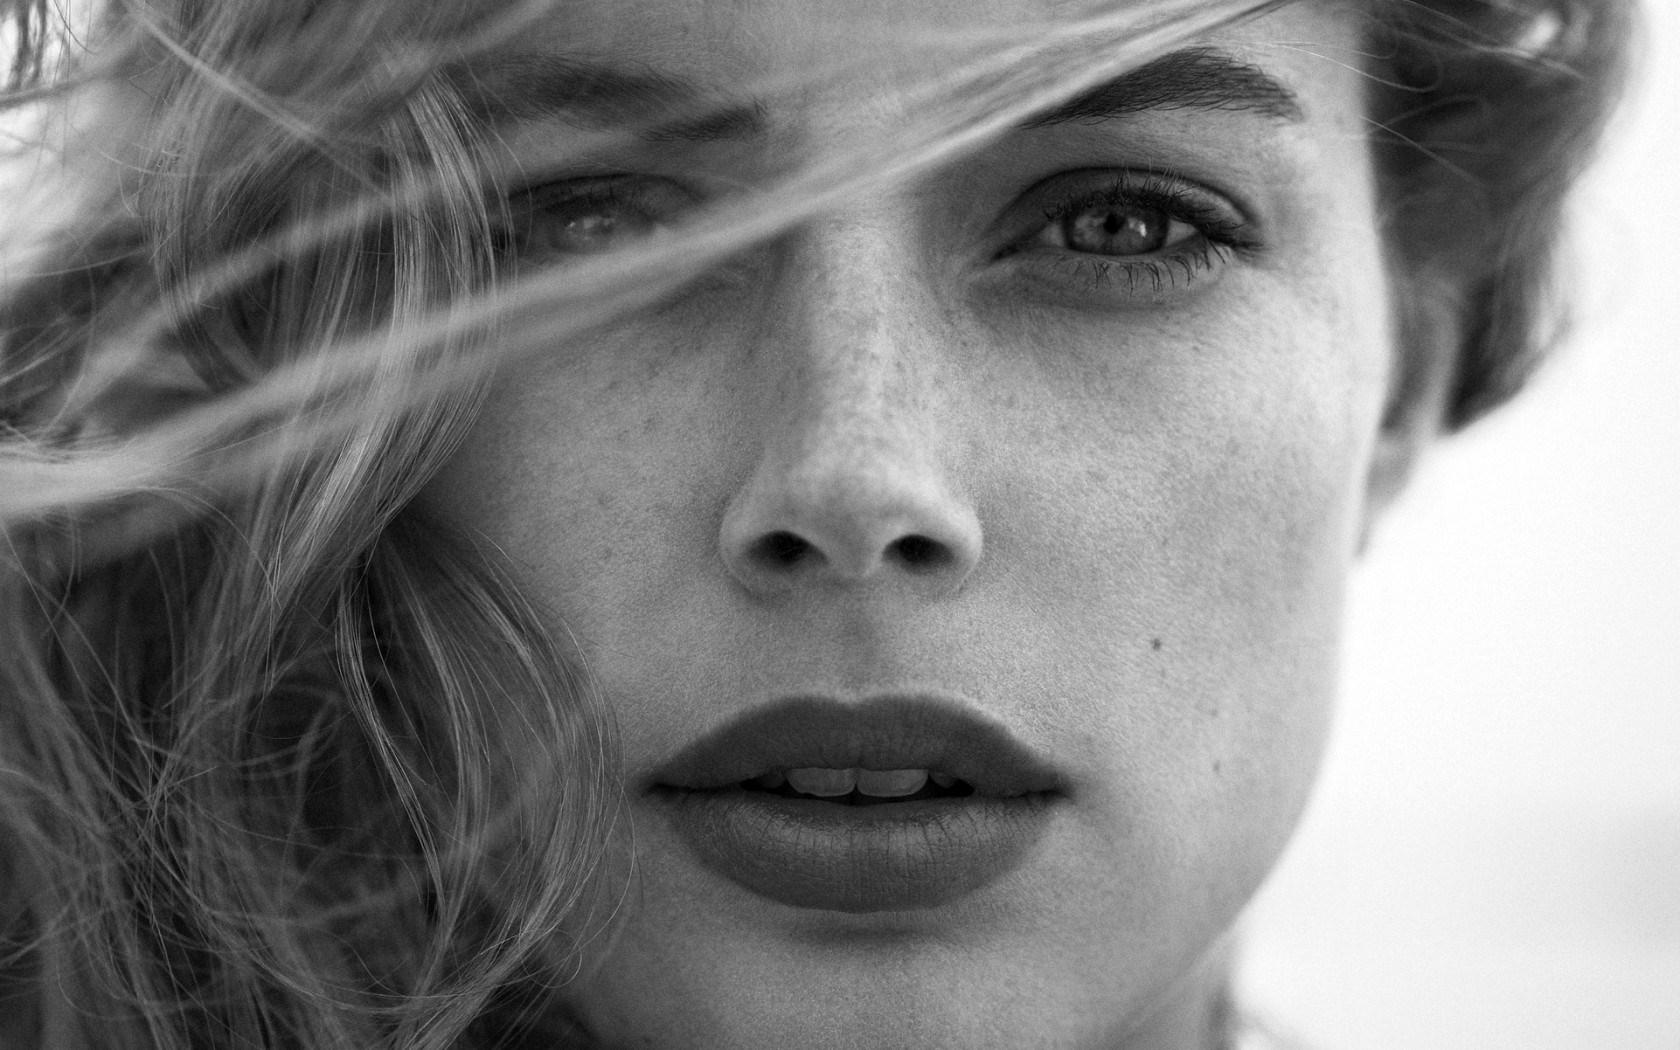 Doutzen Kroes Portrait Girl